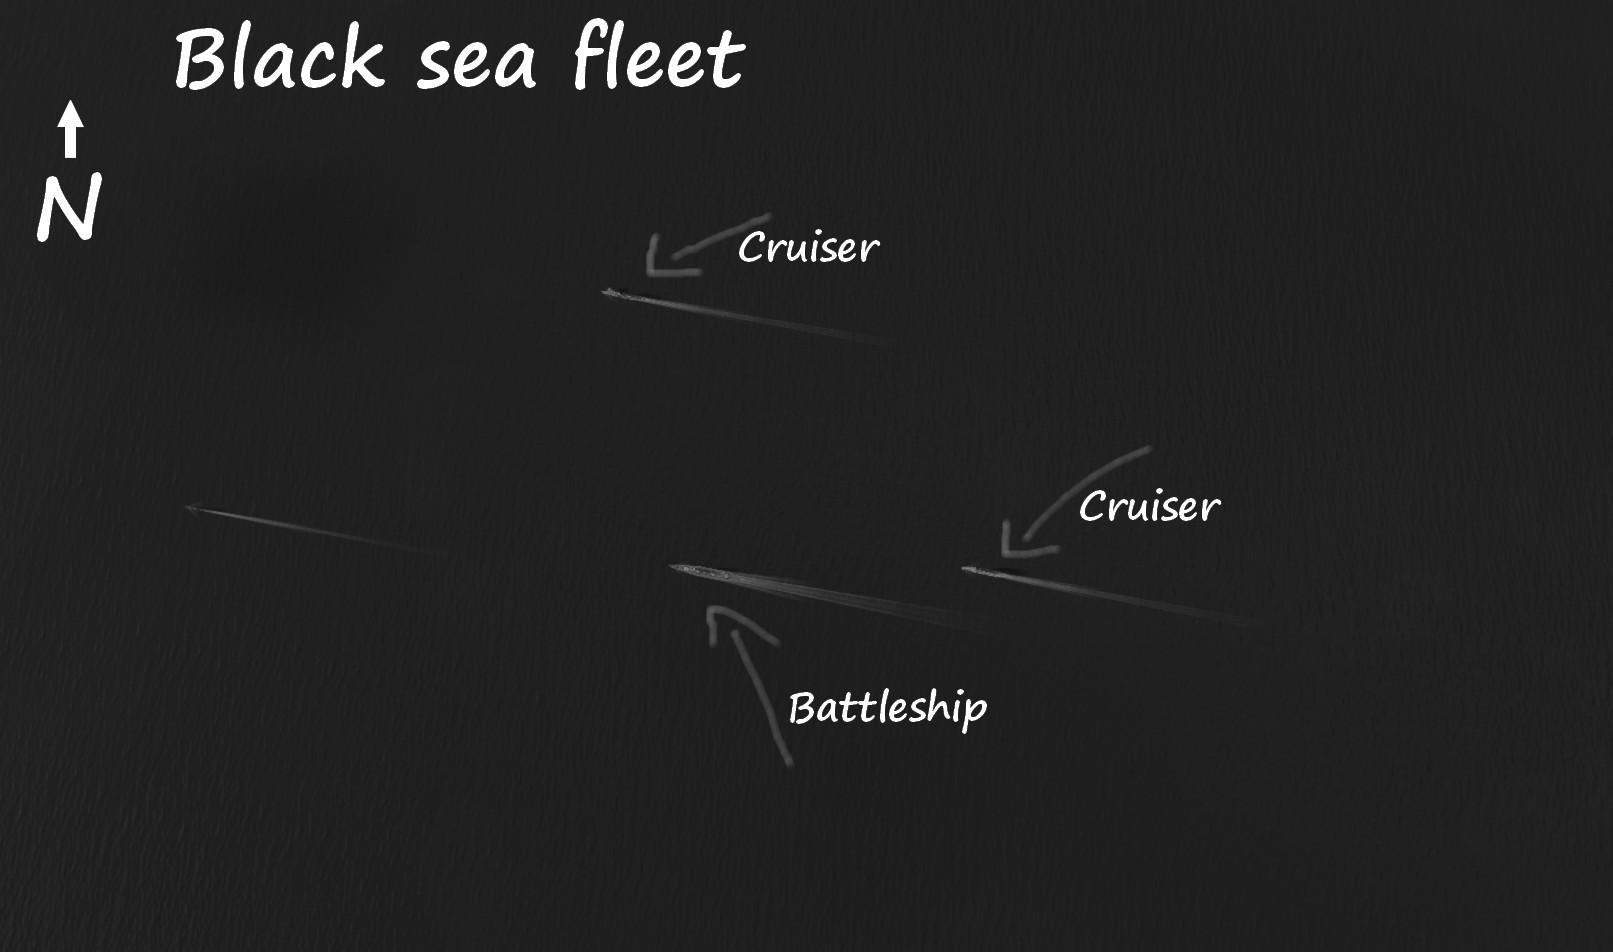 www.sturmovik1946.estranky.cz/img/original/2385/blacksea-fleet.jpg